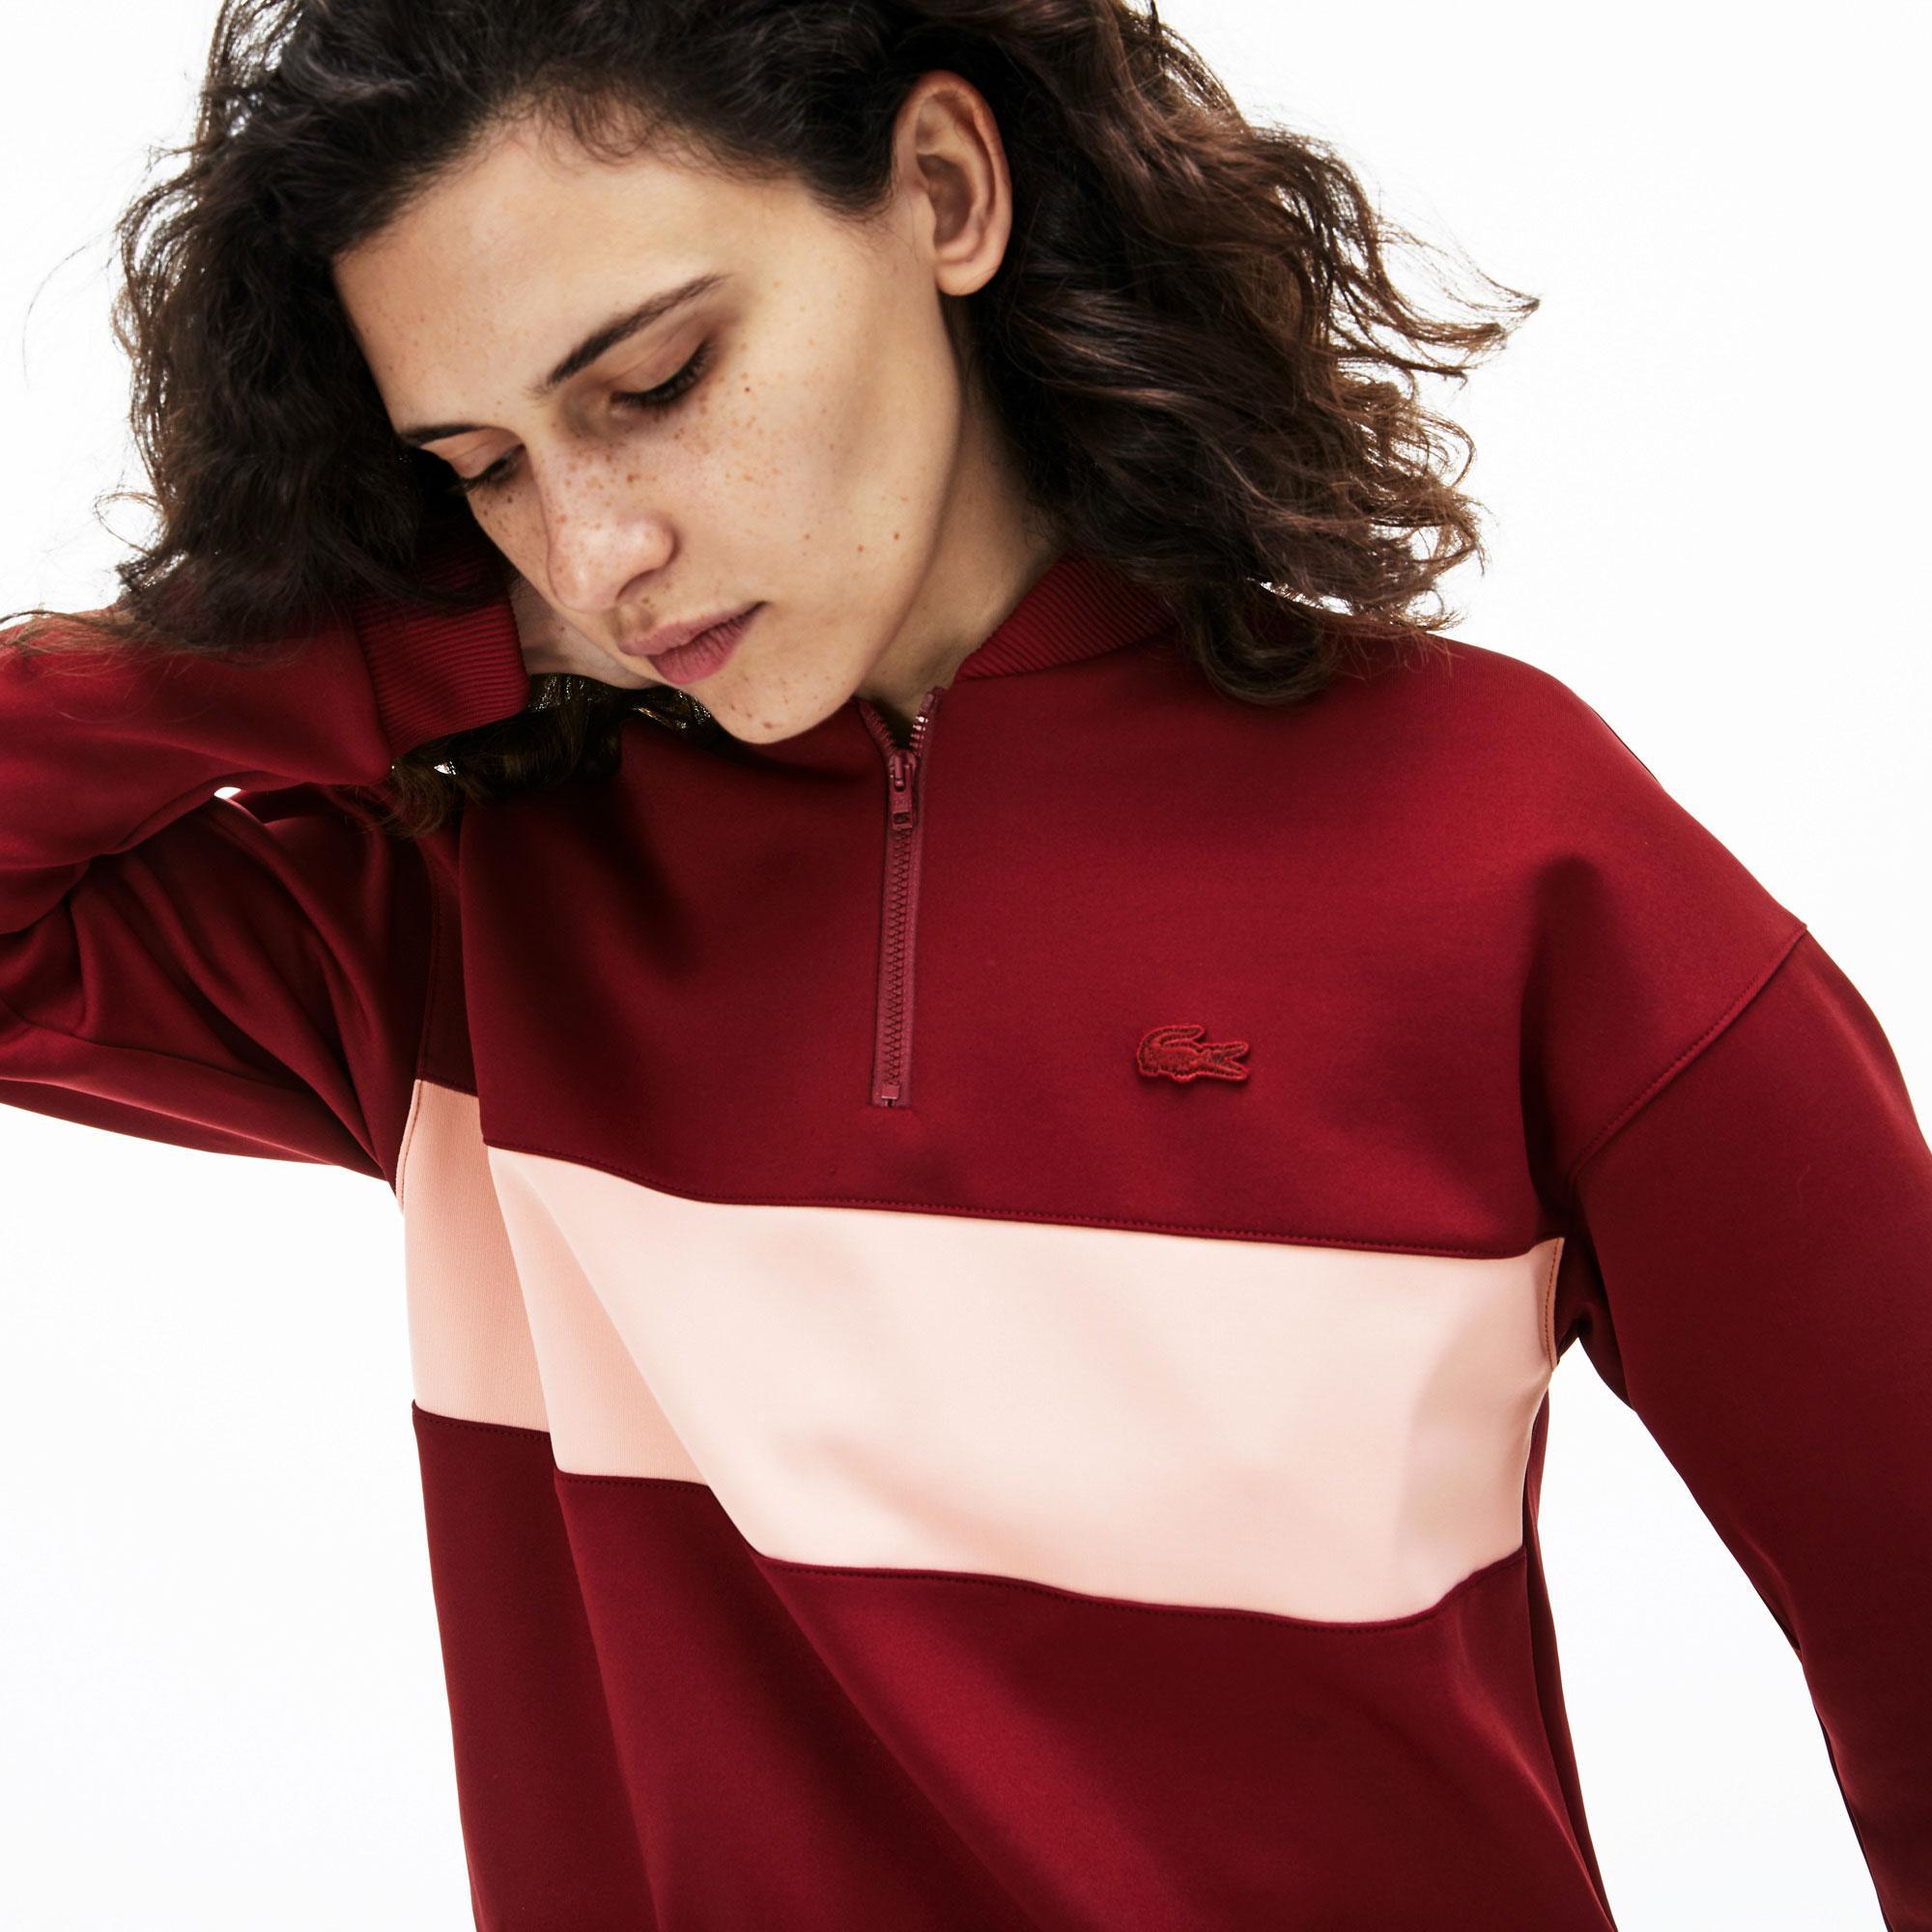 Lacoste Kadın Bordo Sweatshirt